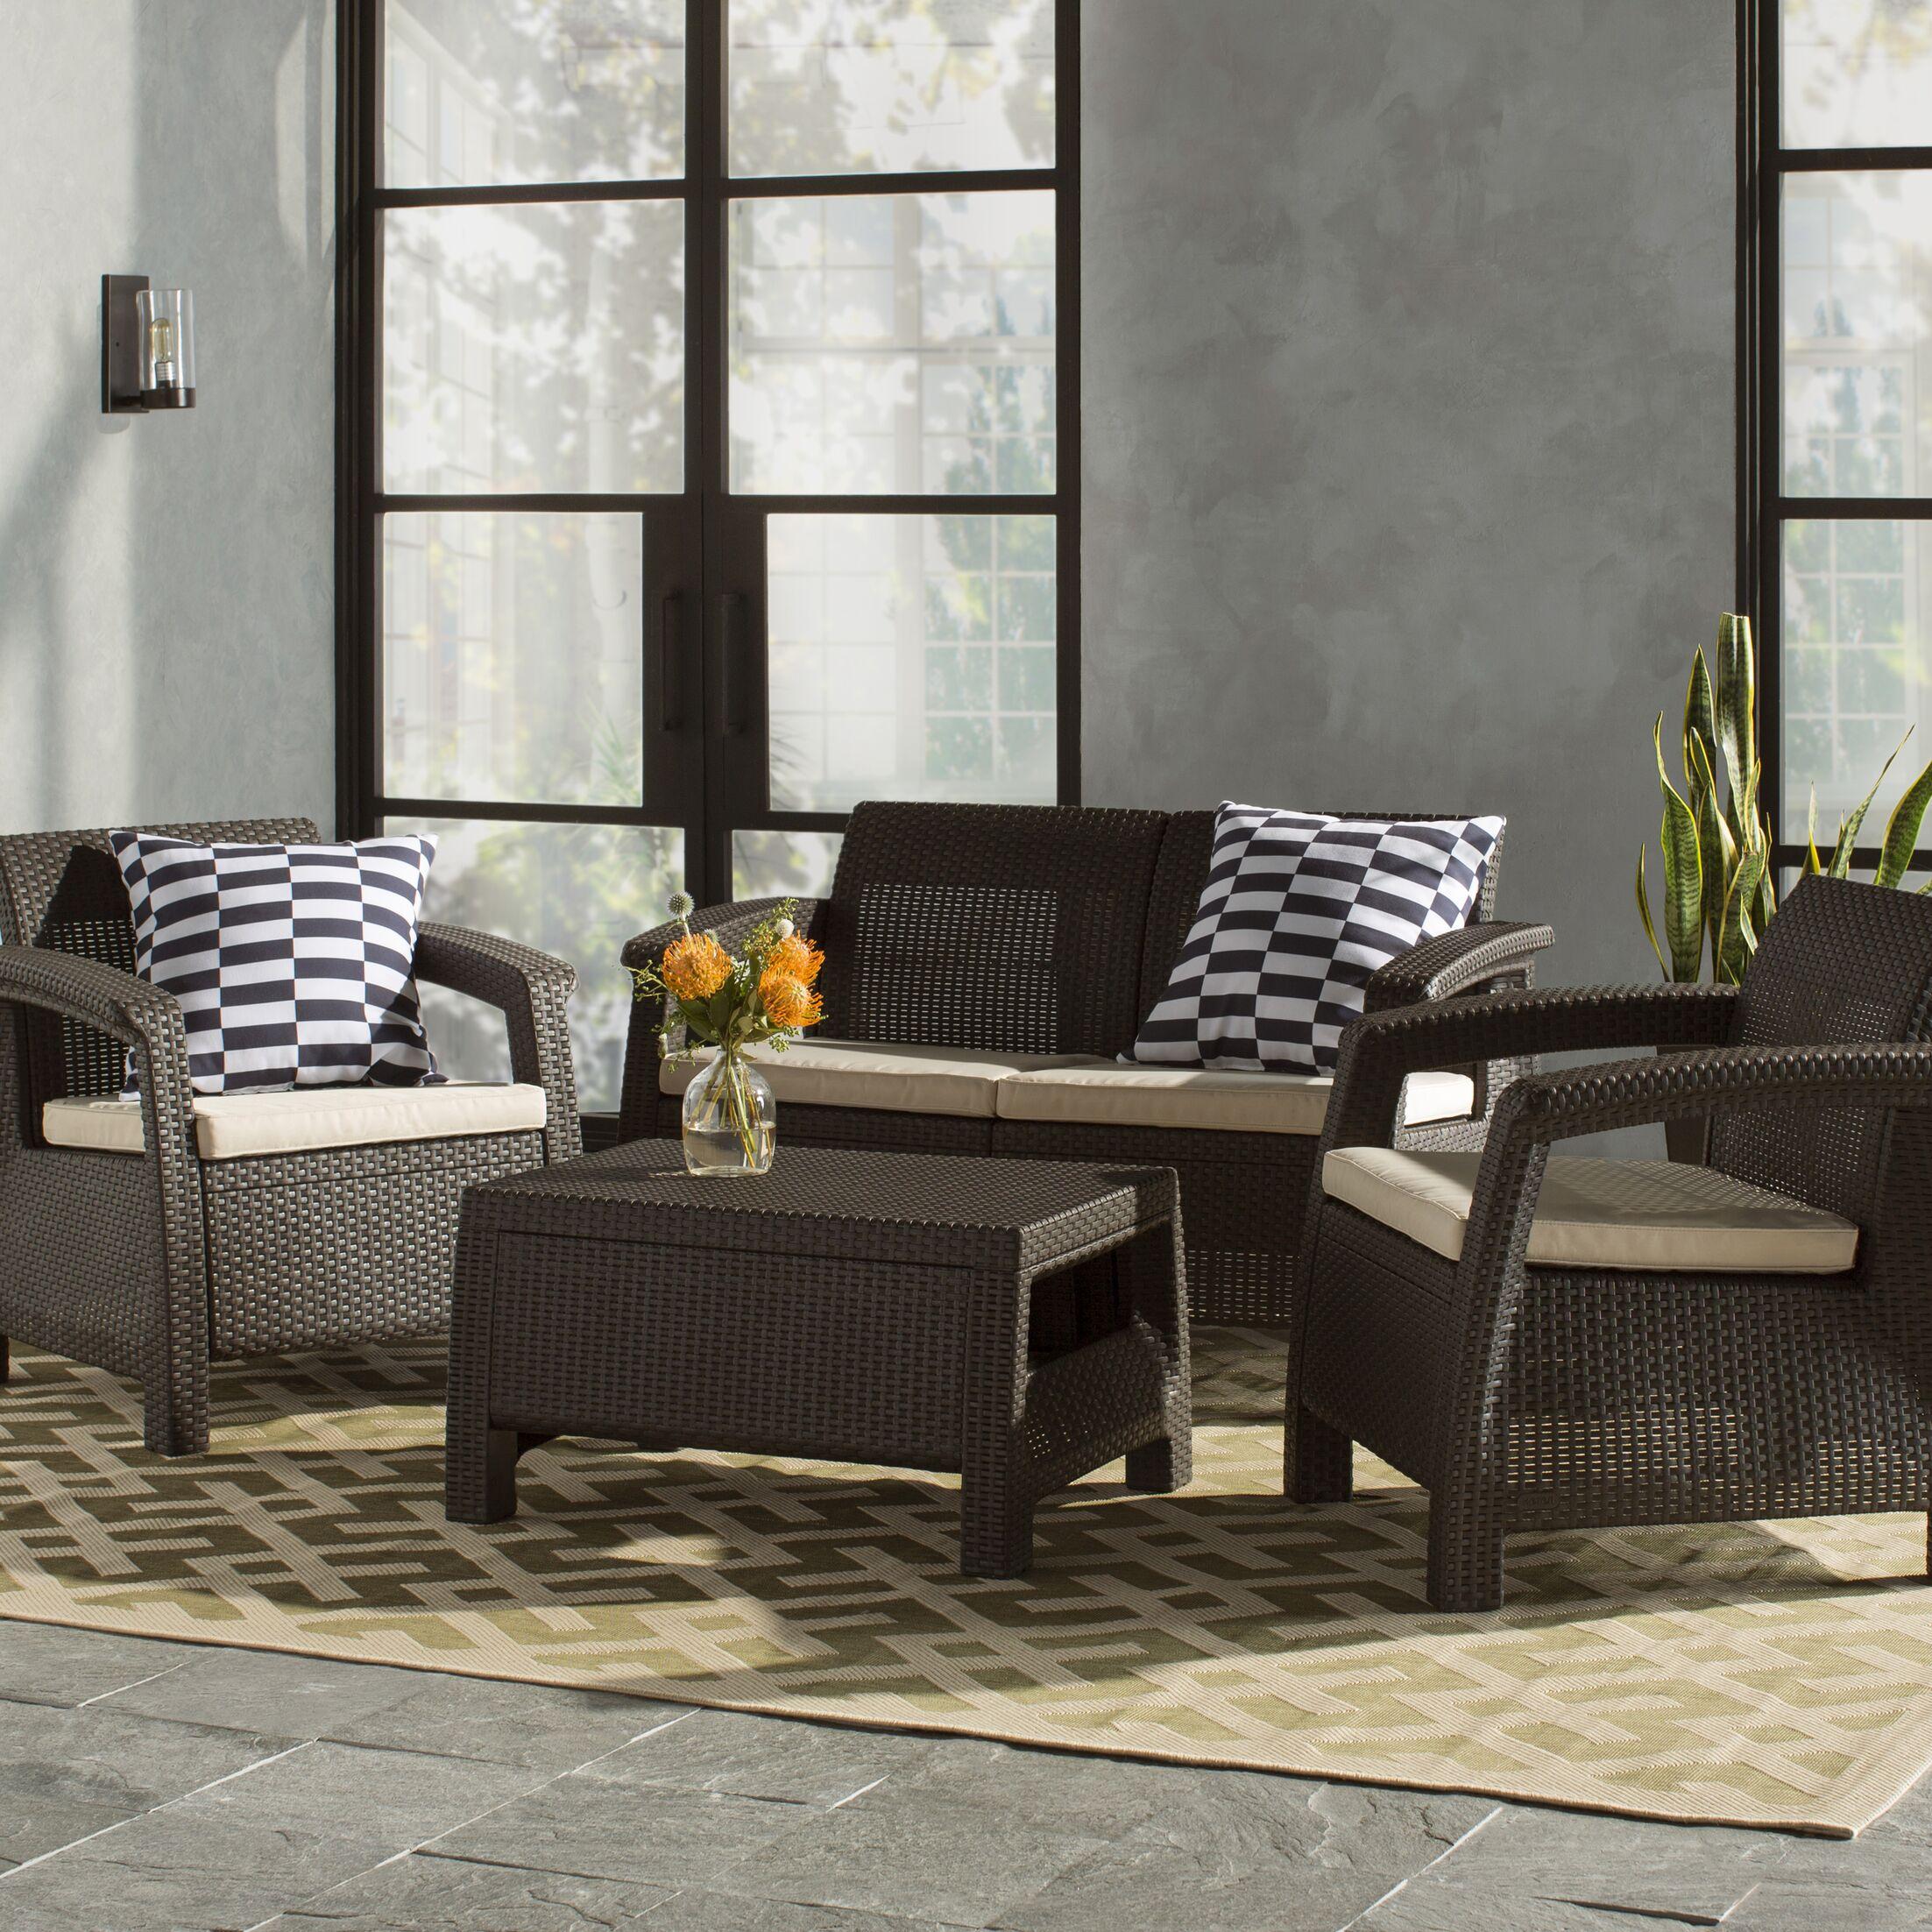 Berard 4 Piece Rattan Sofa Set with Cushions Color: Brown